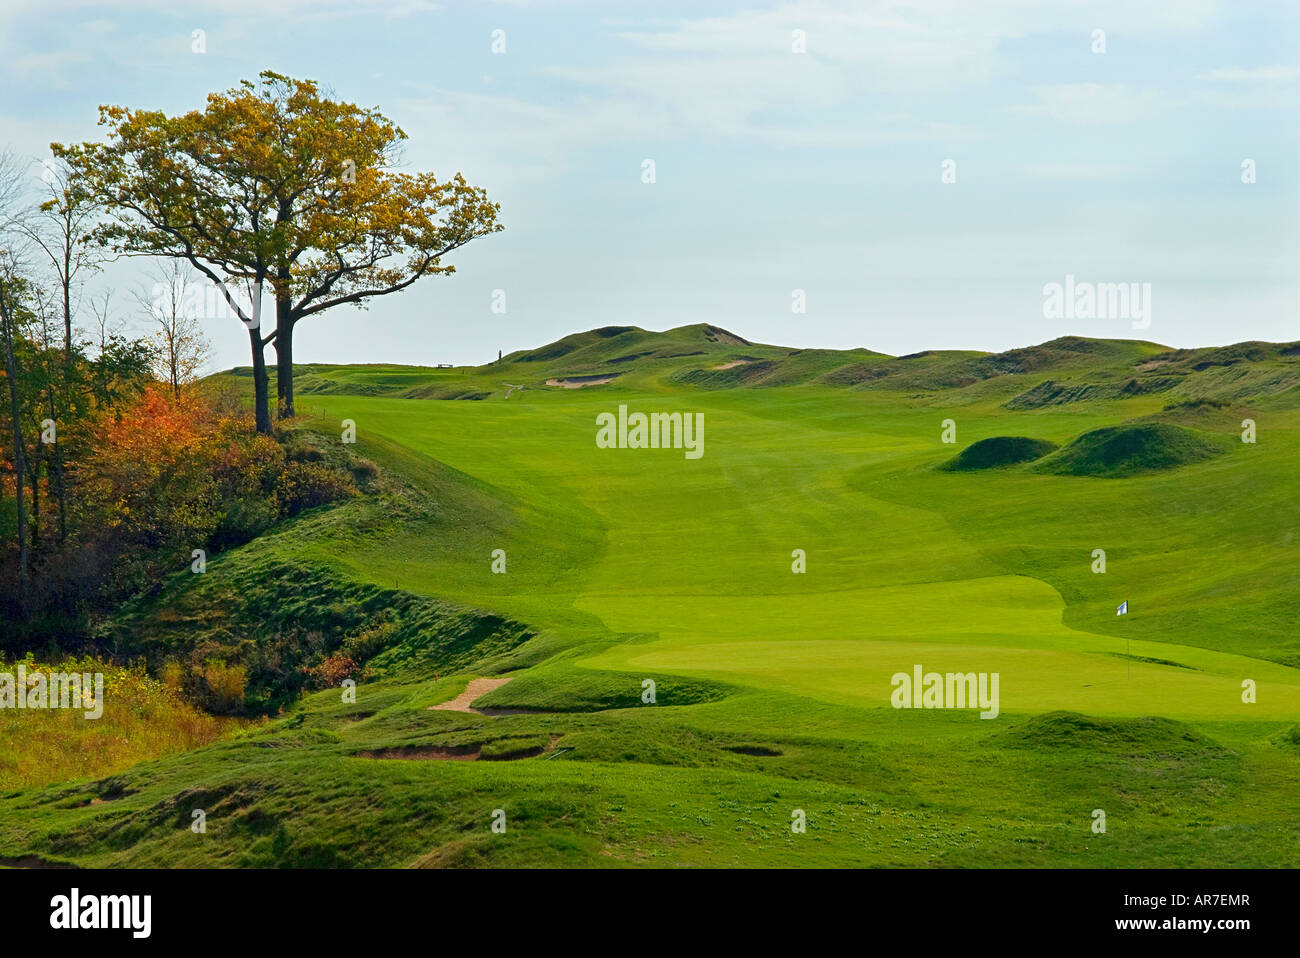 Whistling Straits Golf Course Kohler Wisconsin USA, 9th hole Stock ...